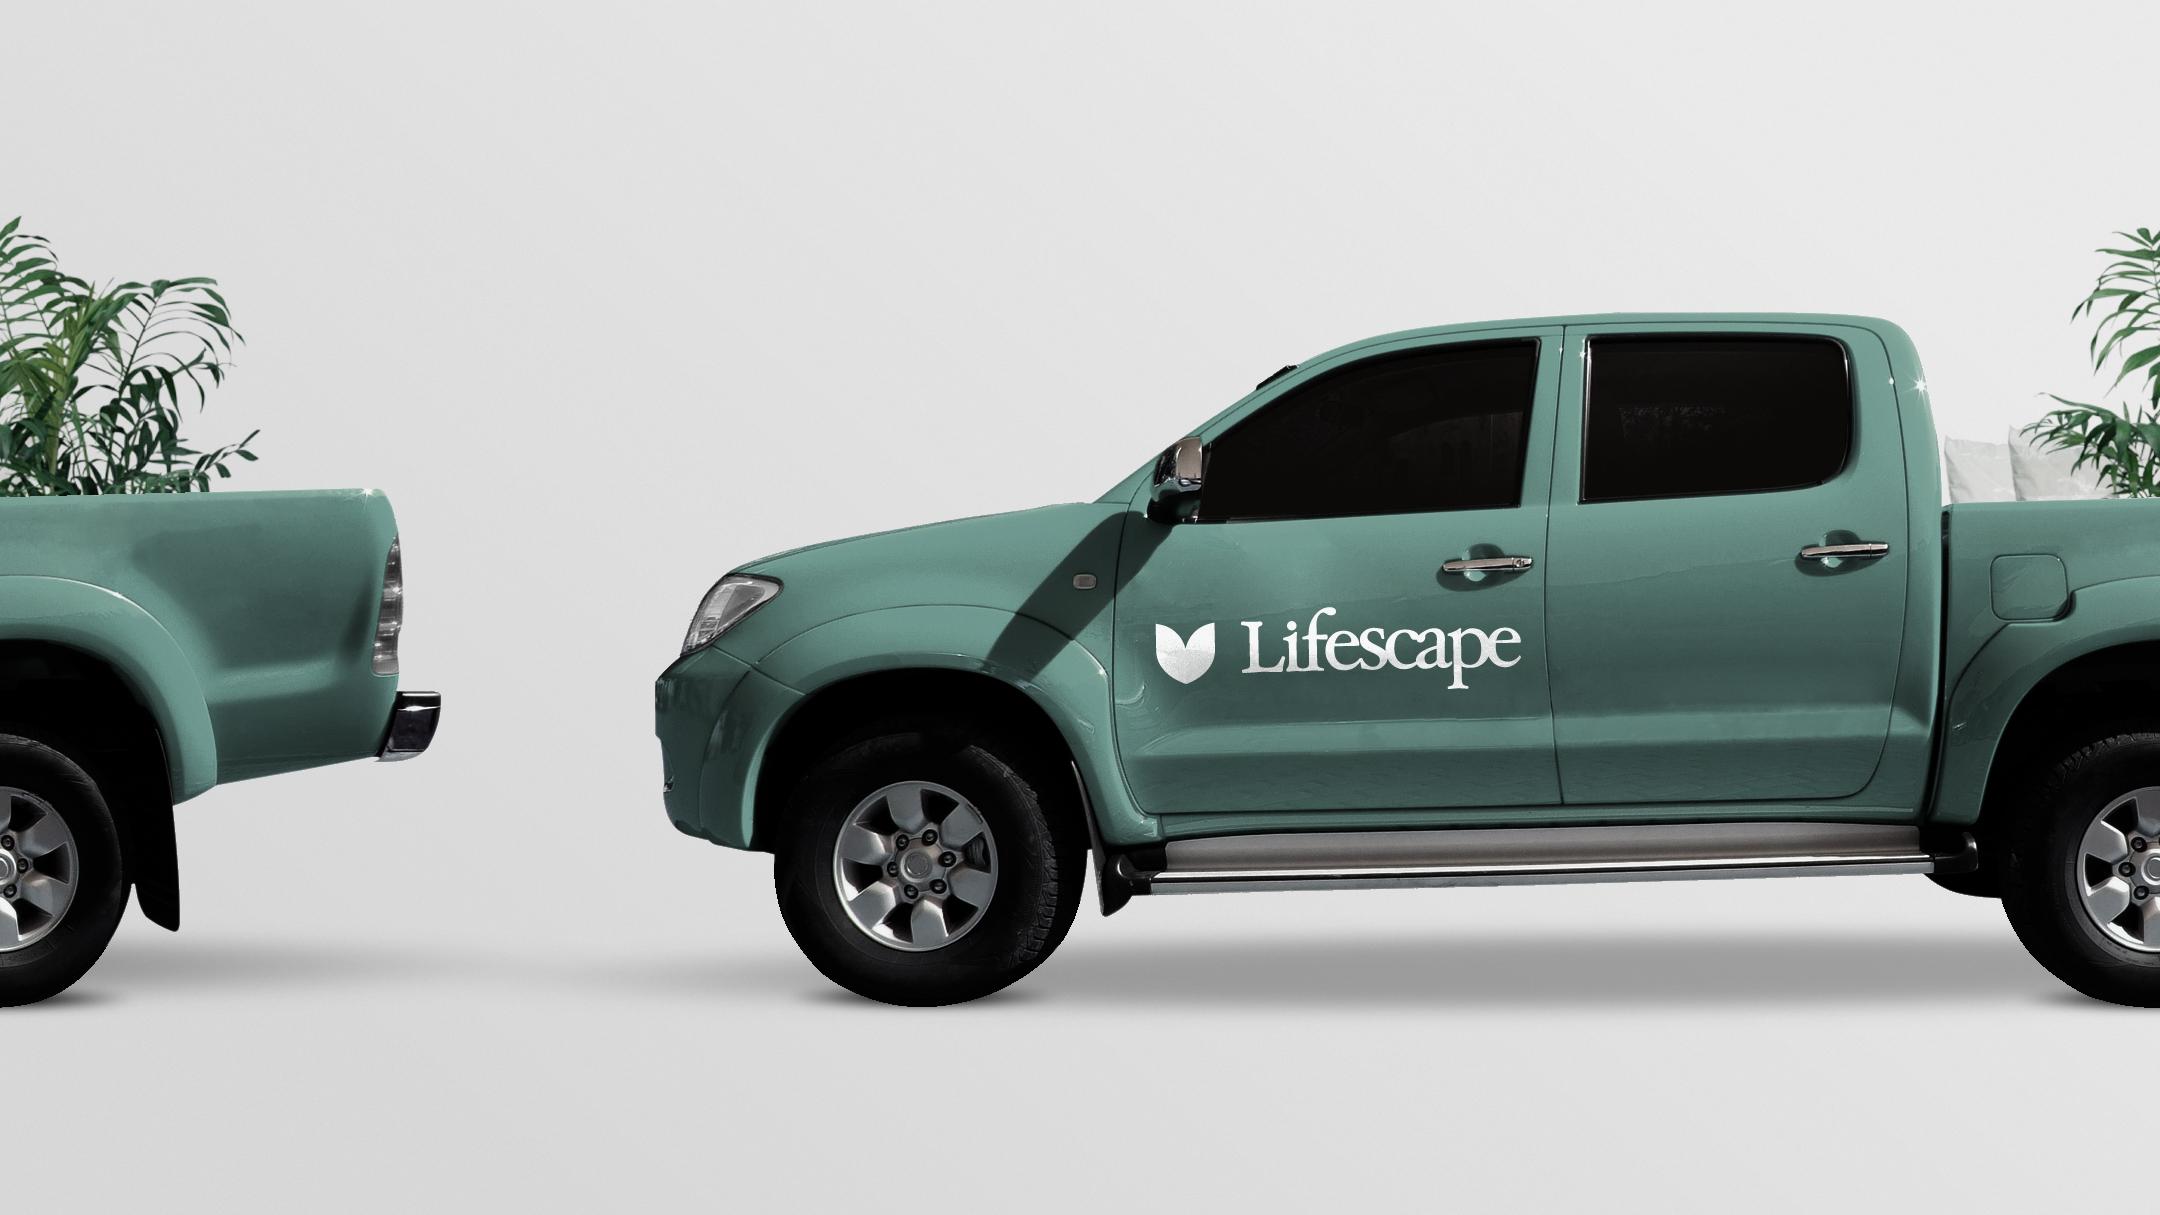 MorganSmail_Lifescape_Truck.jpg